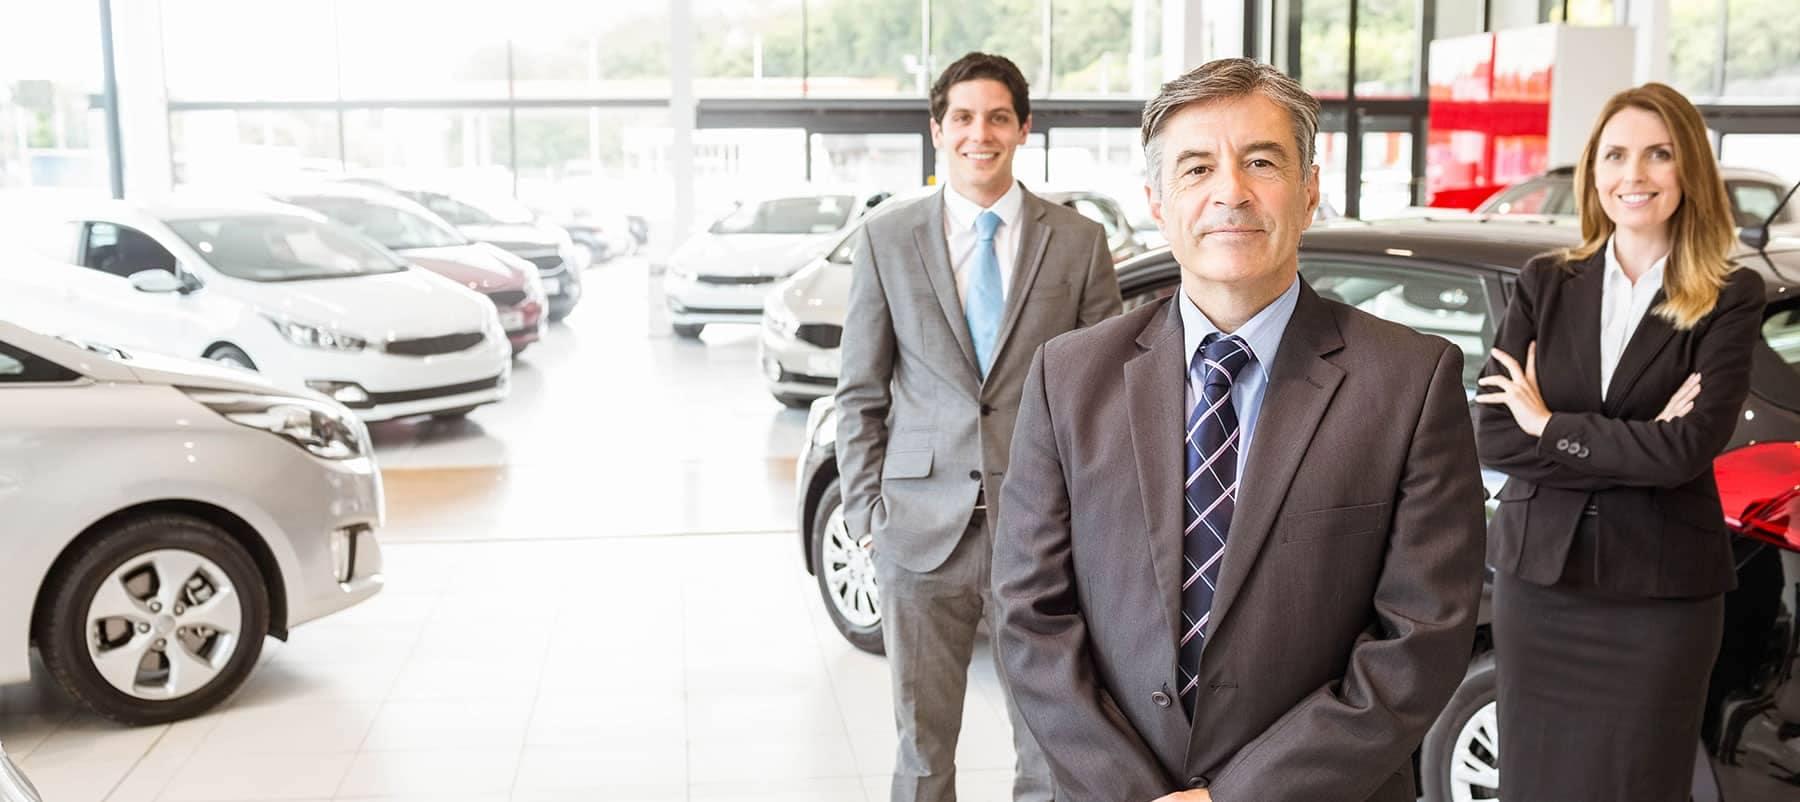 three car salesmen and saleswomen in suits standing in their showroom